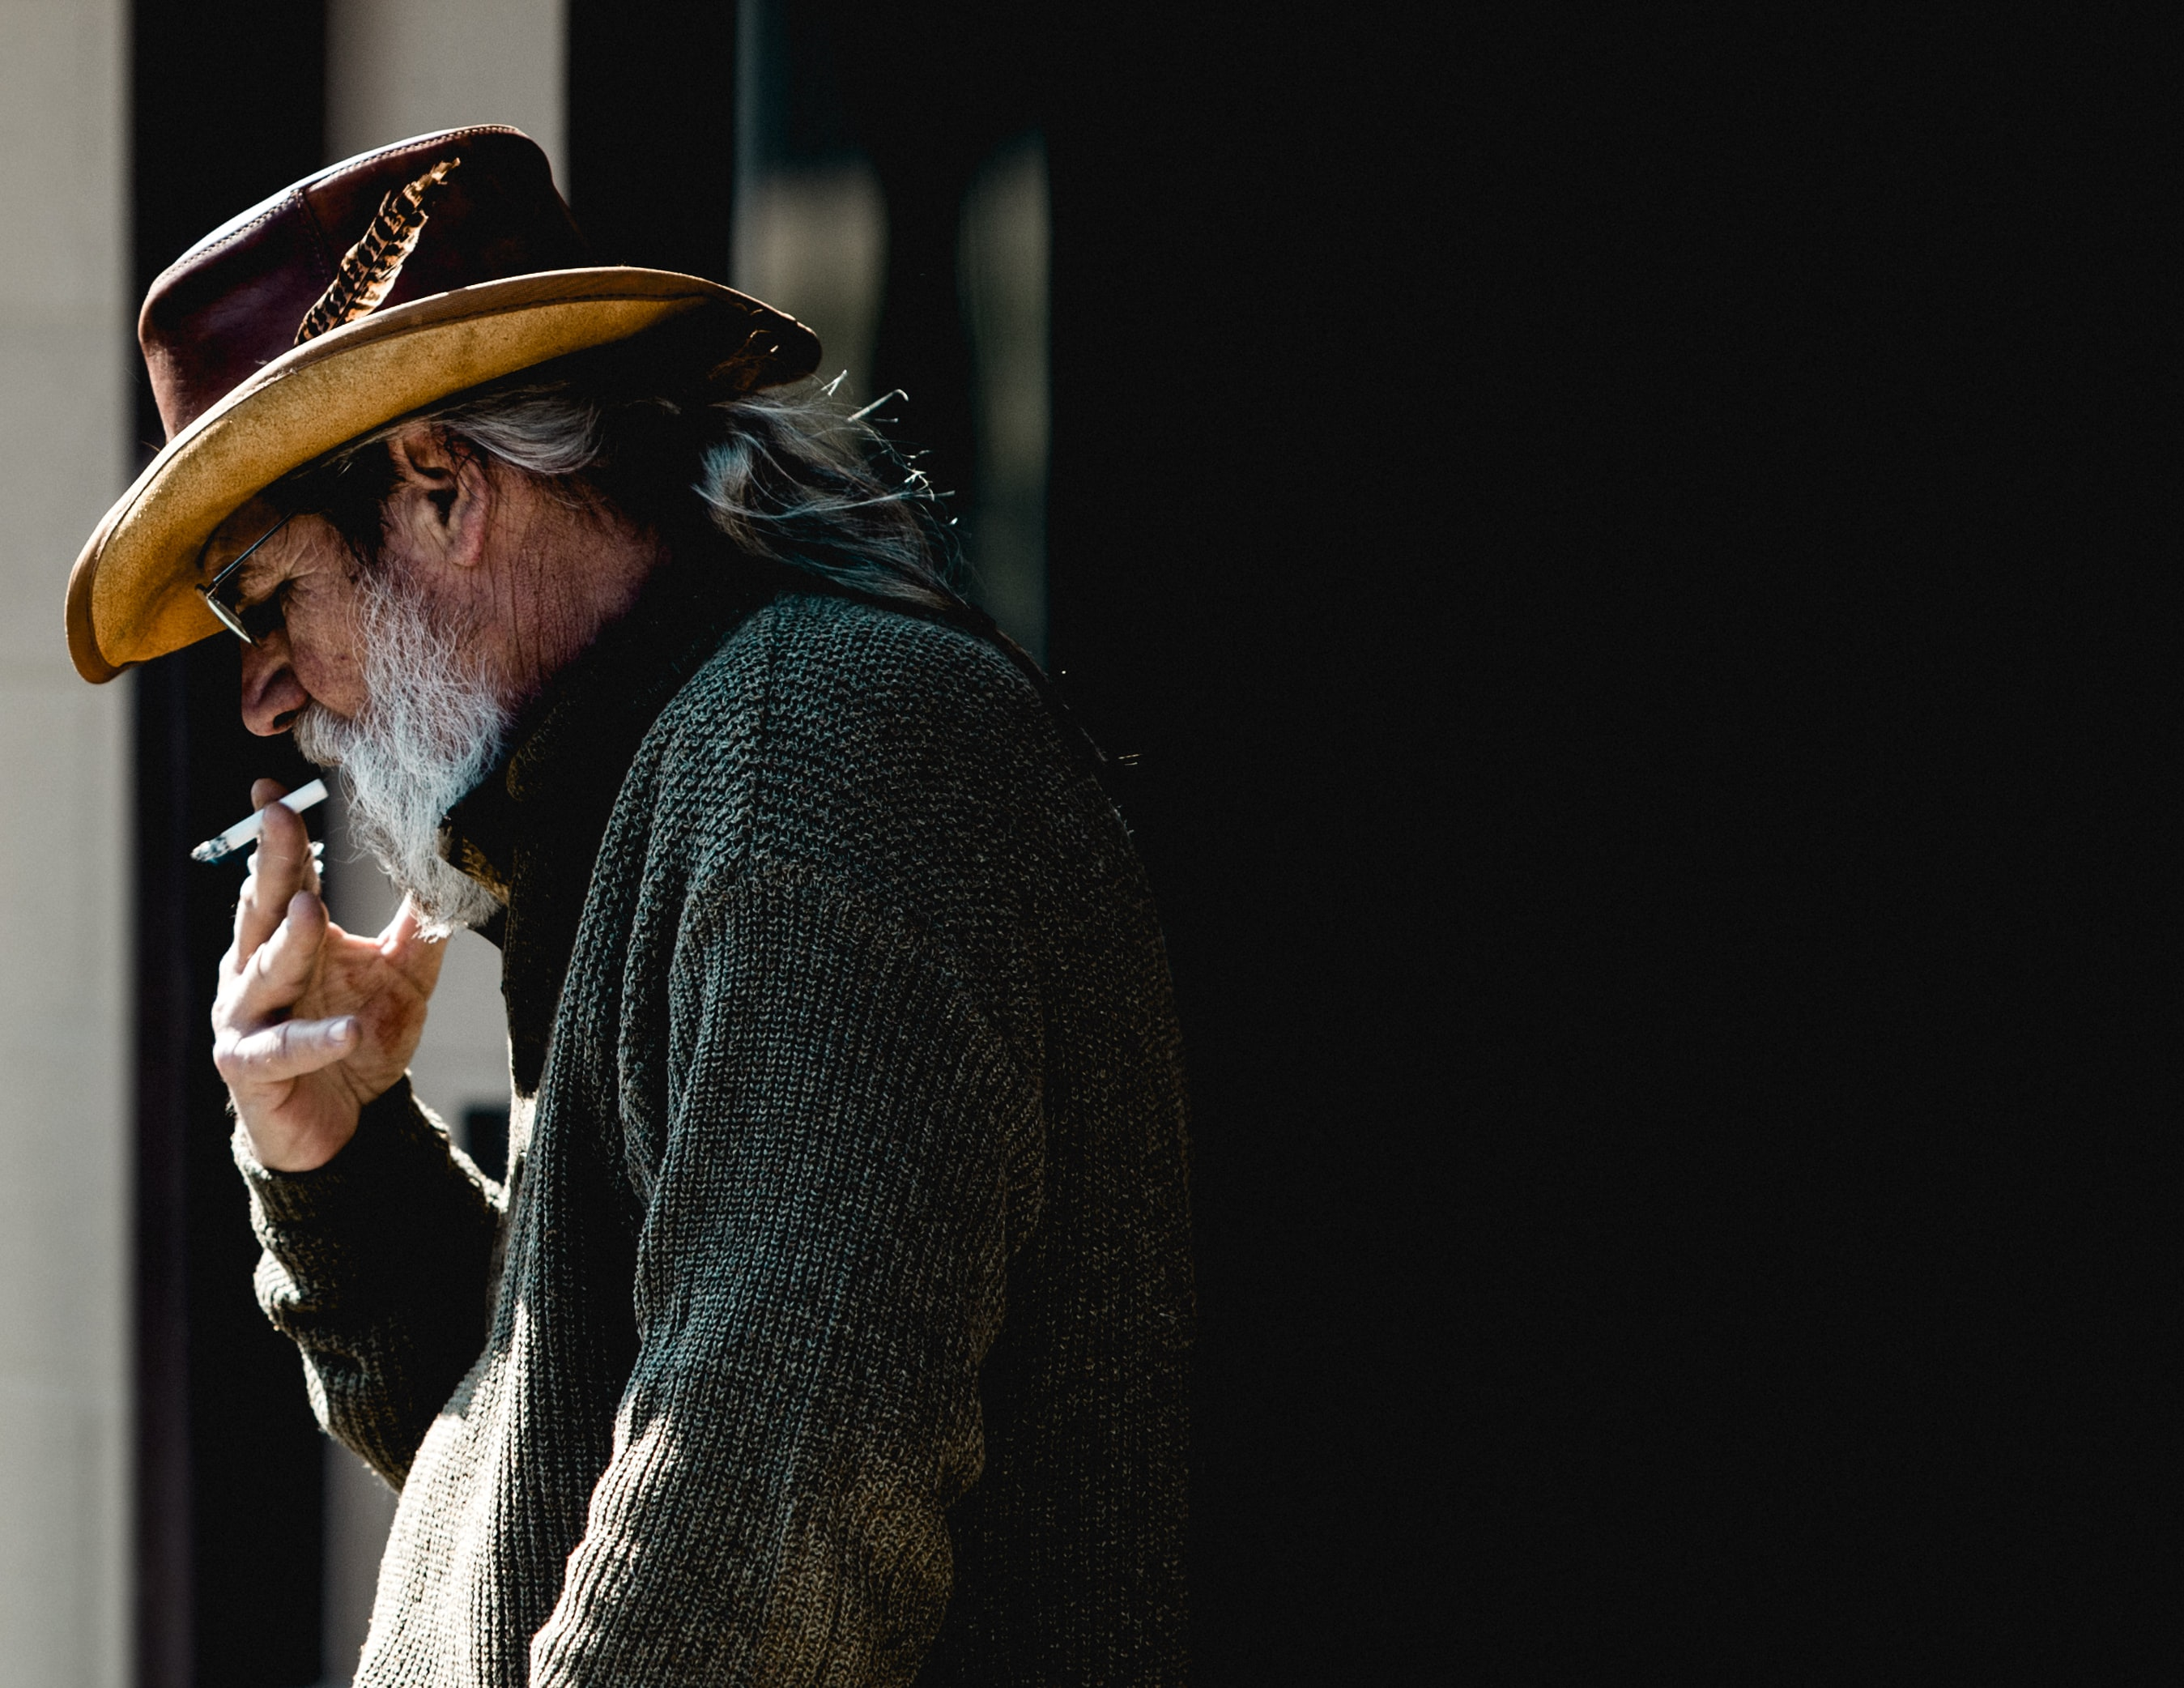 man standing while smoking cigarette